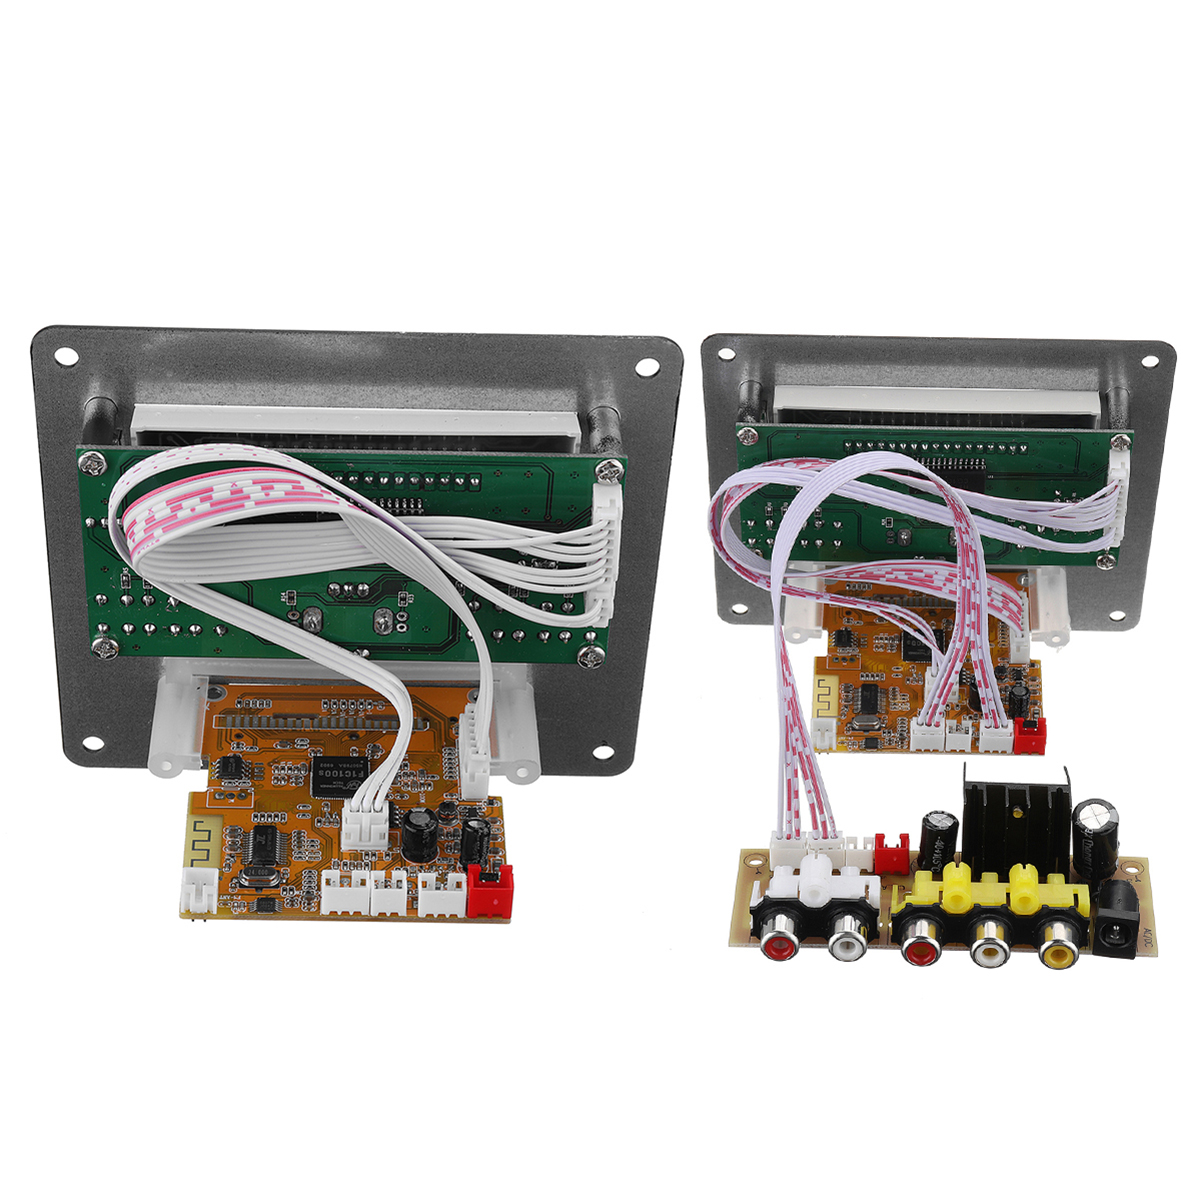 Audio HD RM / RMVB/ MP4/ WMV Video Decoder Bluetooth Receiver Lossless WAV/AC3/OGG/ACC/WMA/MP3 decoder SD card USB decode play